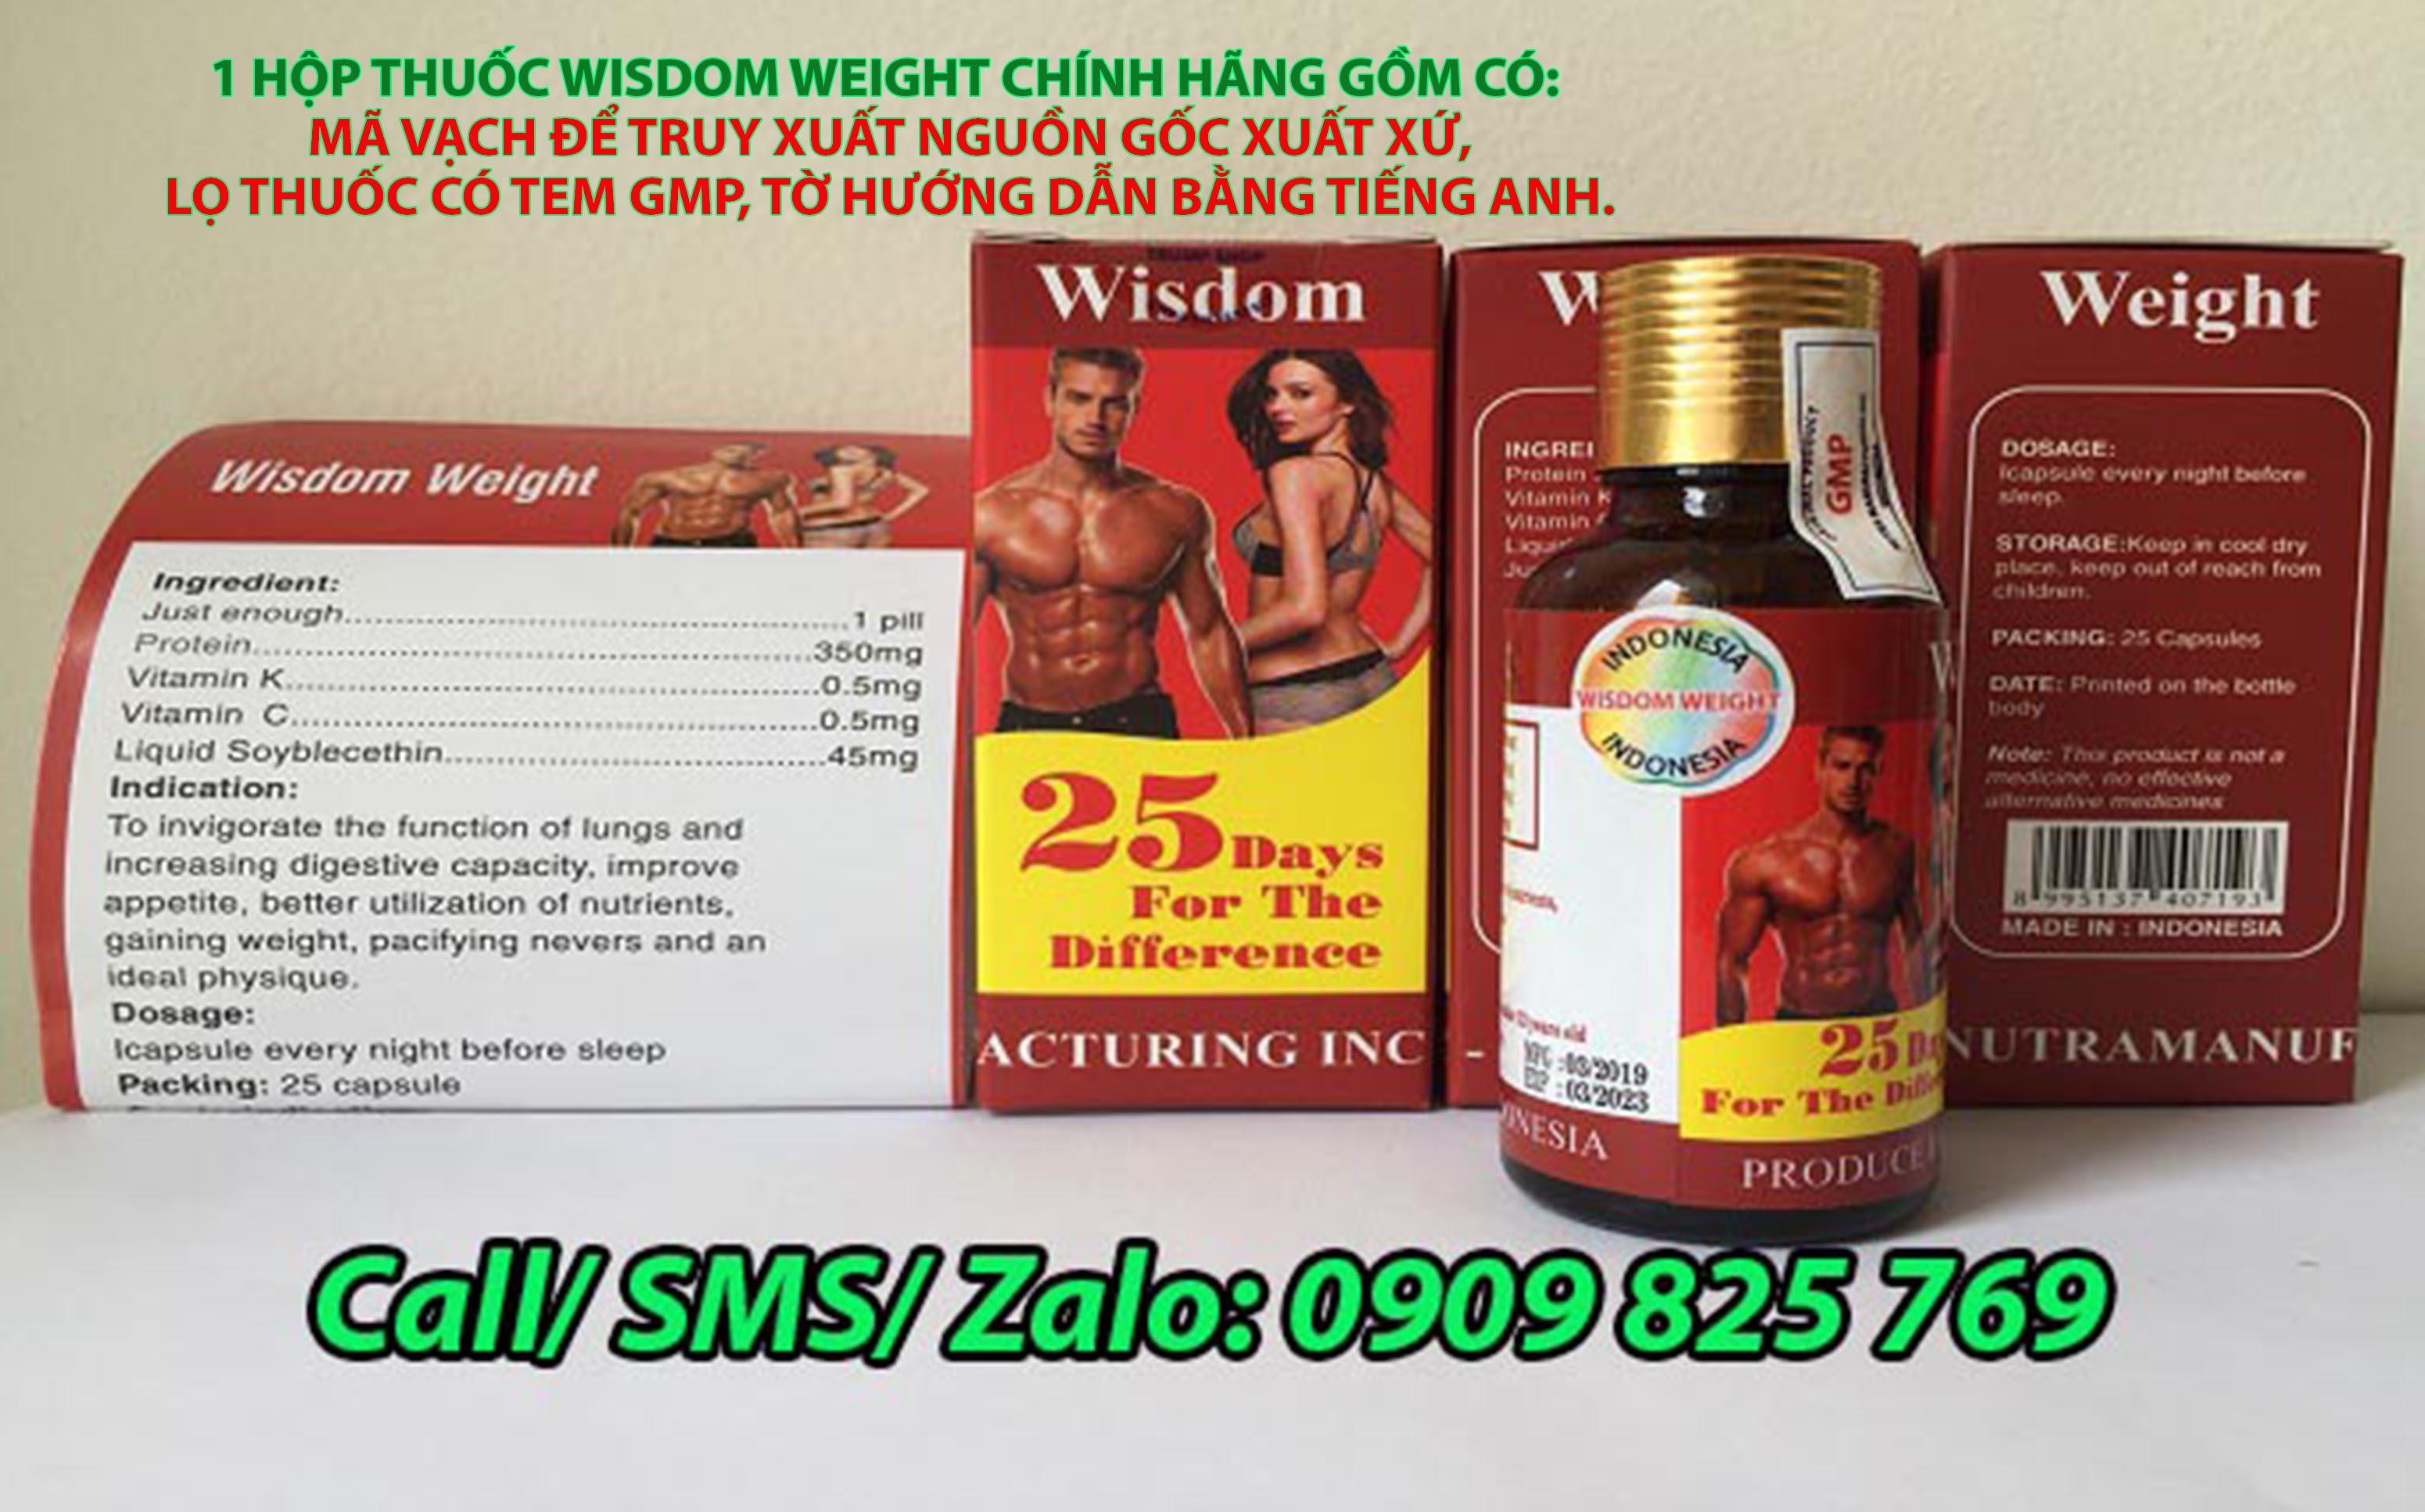 Thuốc tăng cân Wisdom Weight của Indonesia